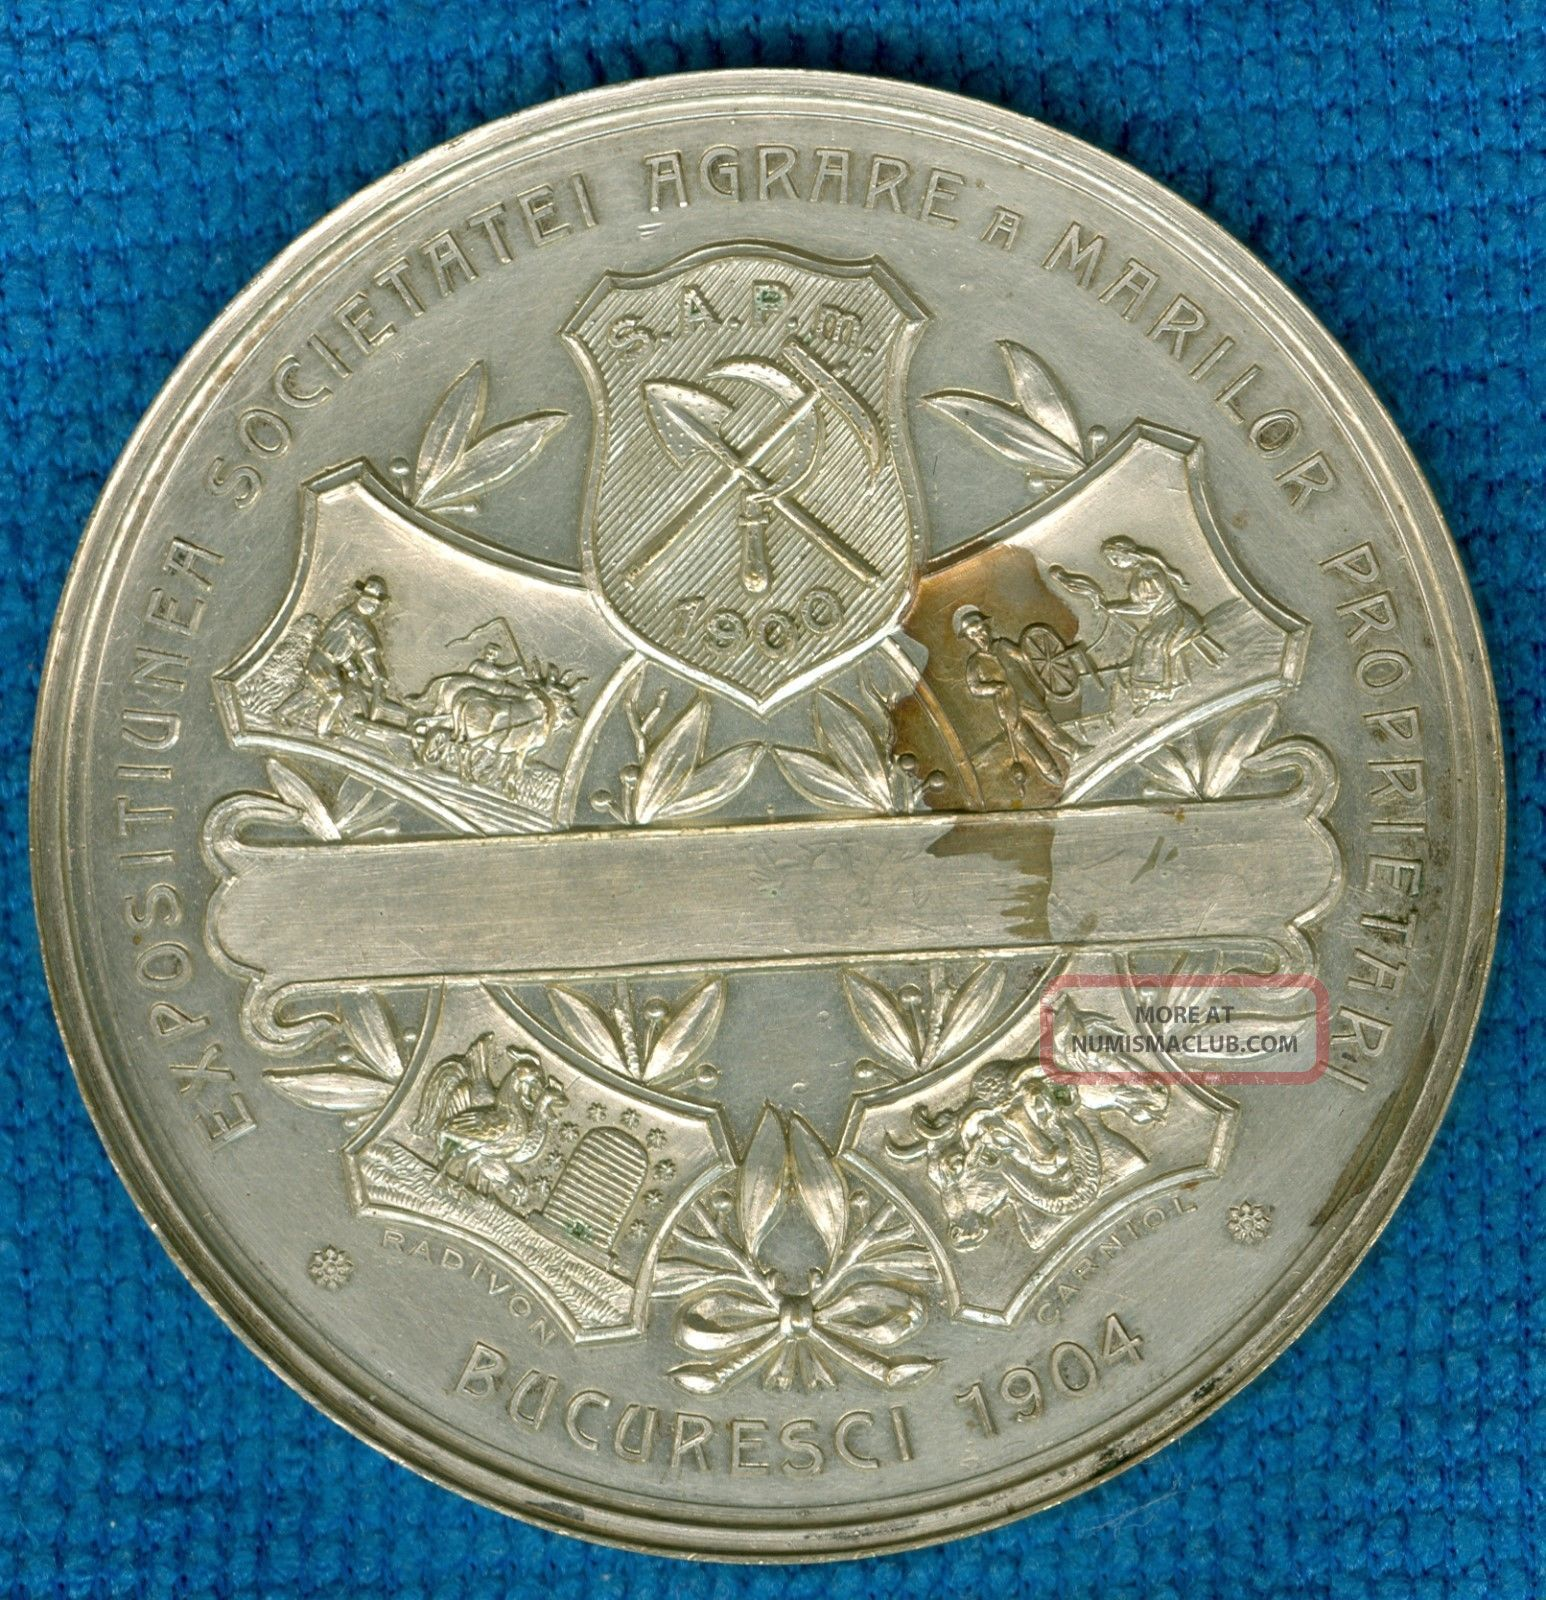 1904 Romanian Medal For Bucharest International